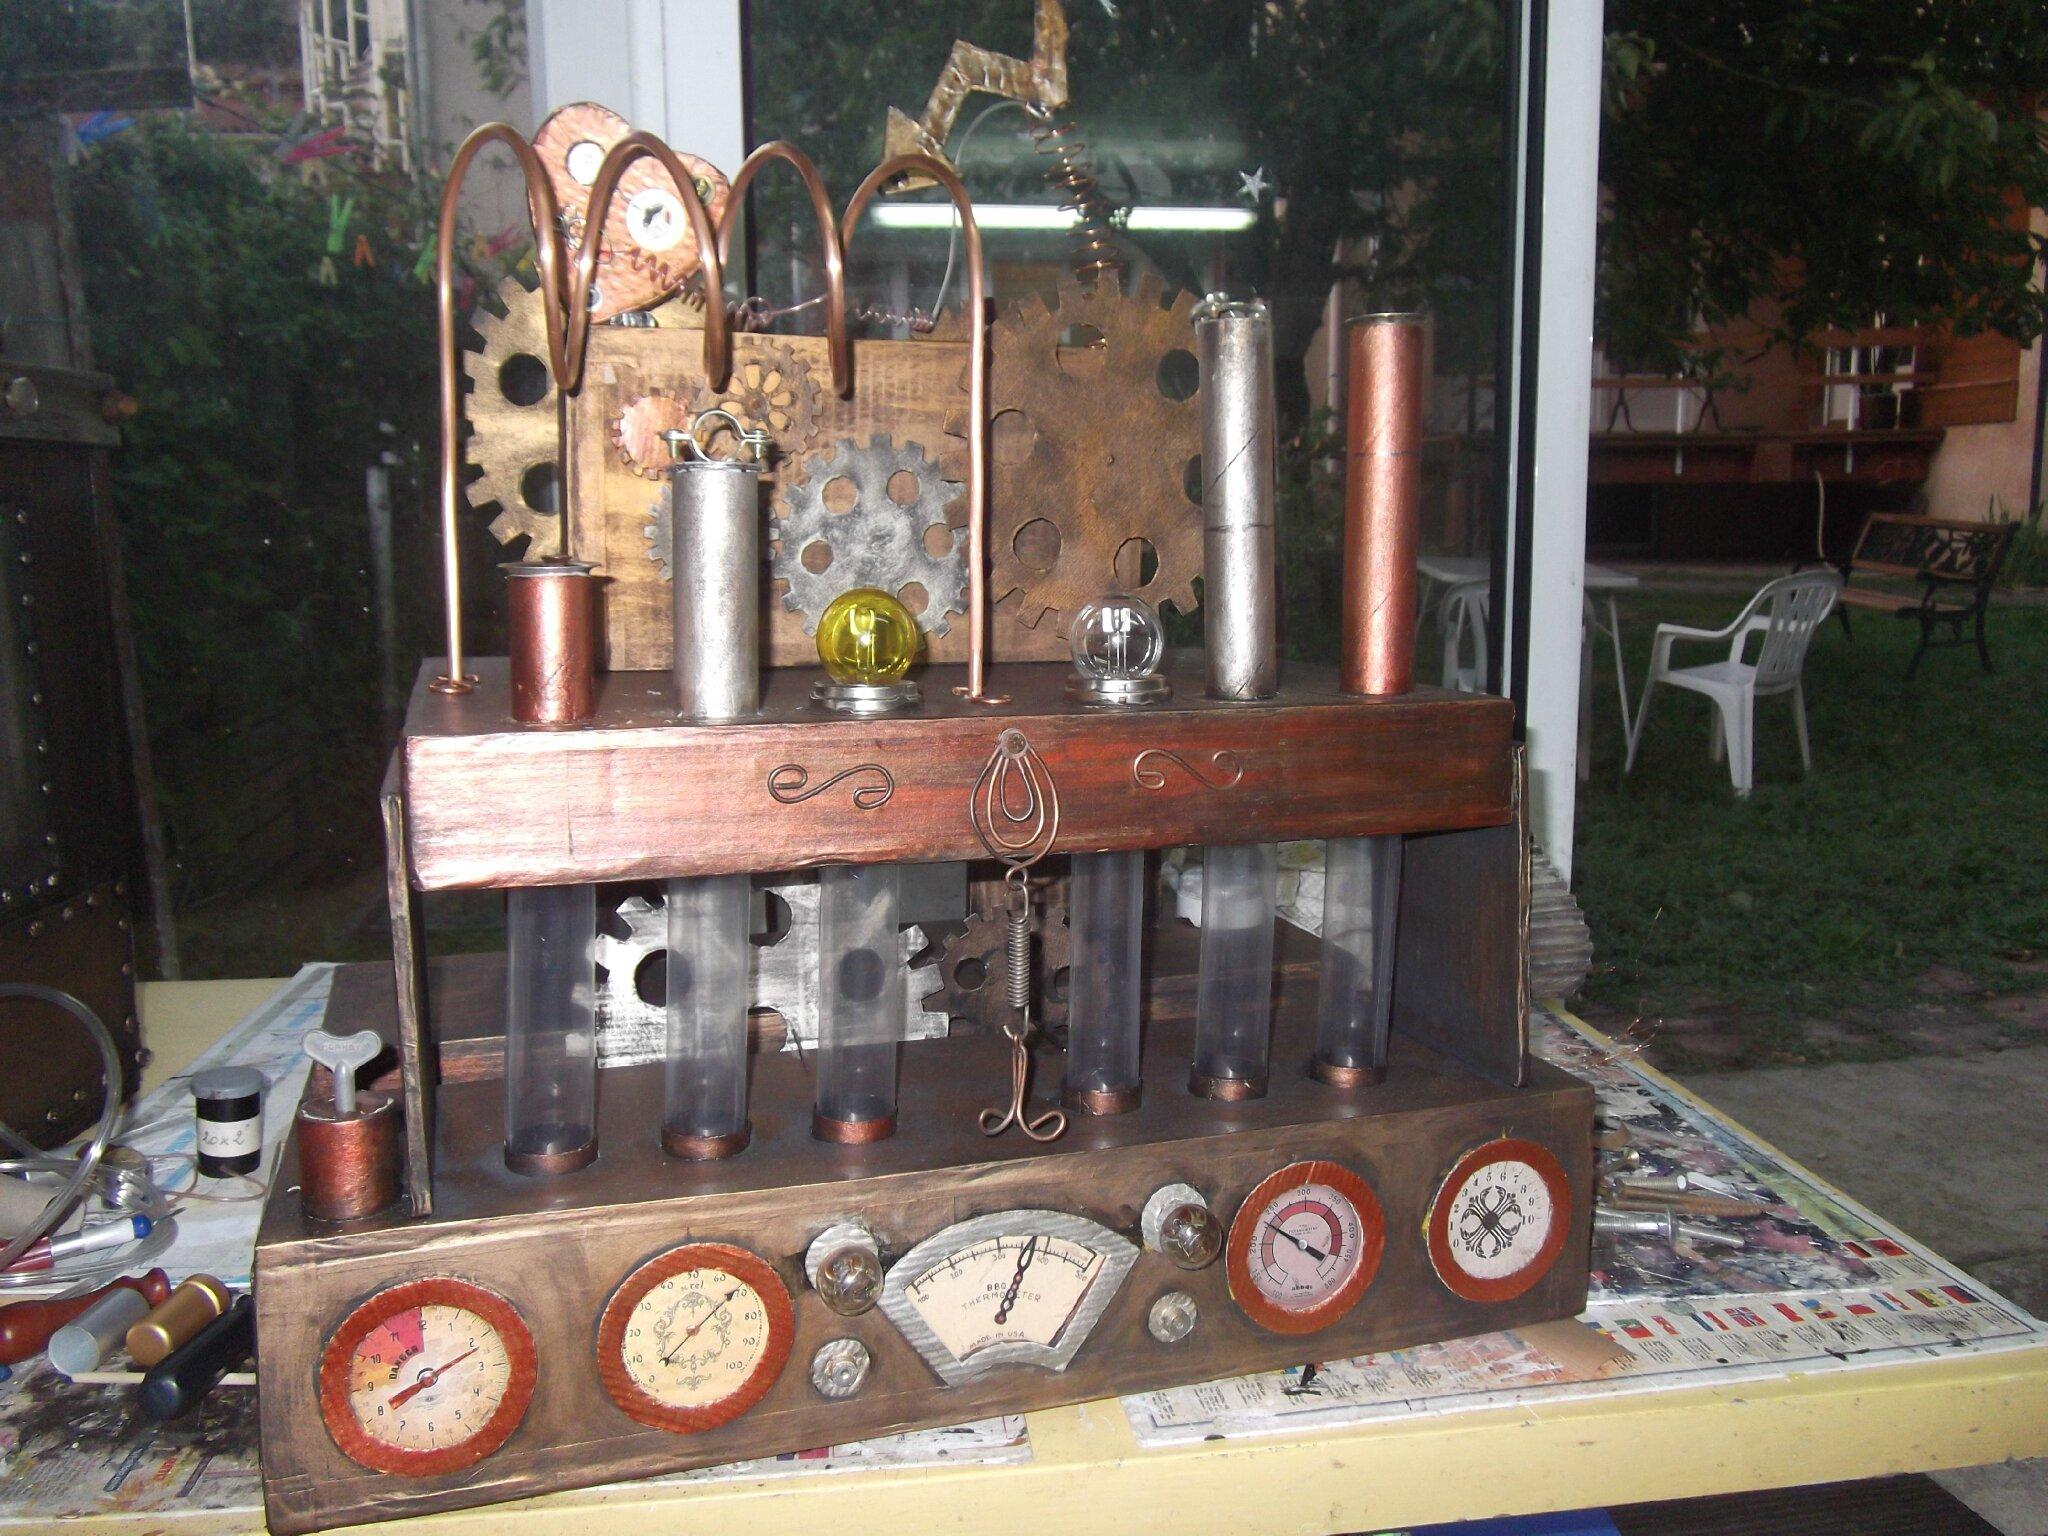 mariage d co steampunk le blog de matsa carton d co. Black Bedroom Furniture Sets. Home Design Ideas